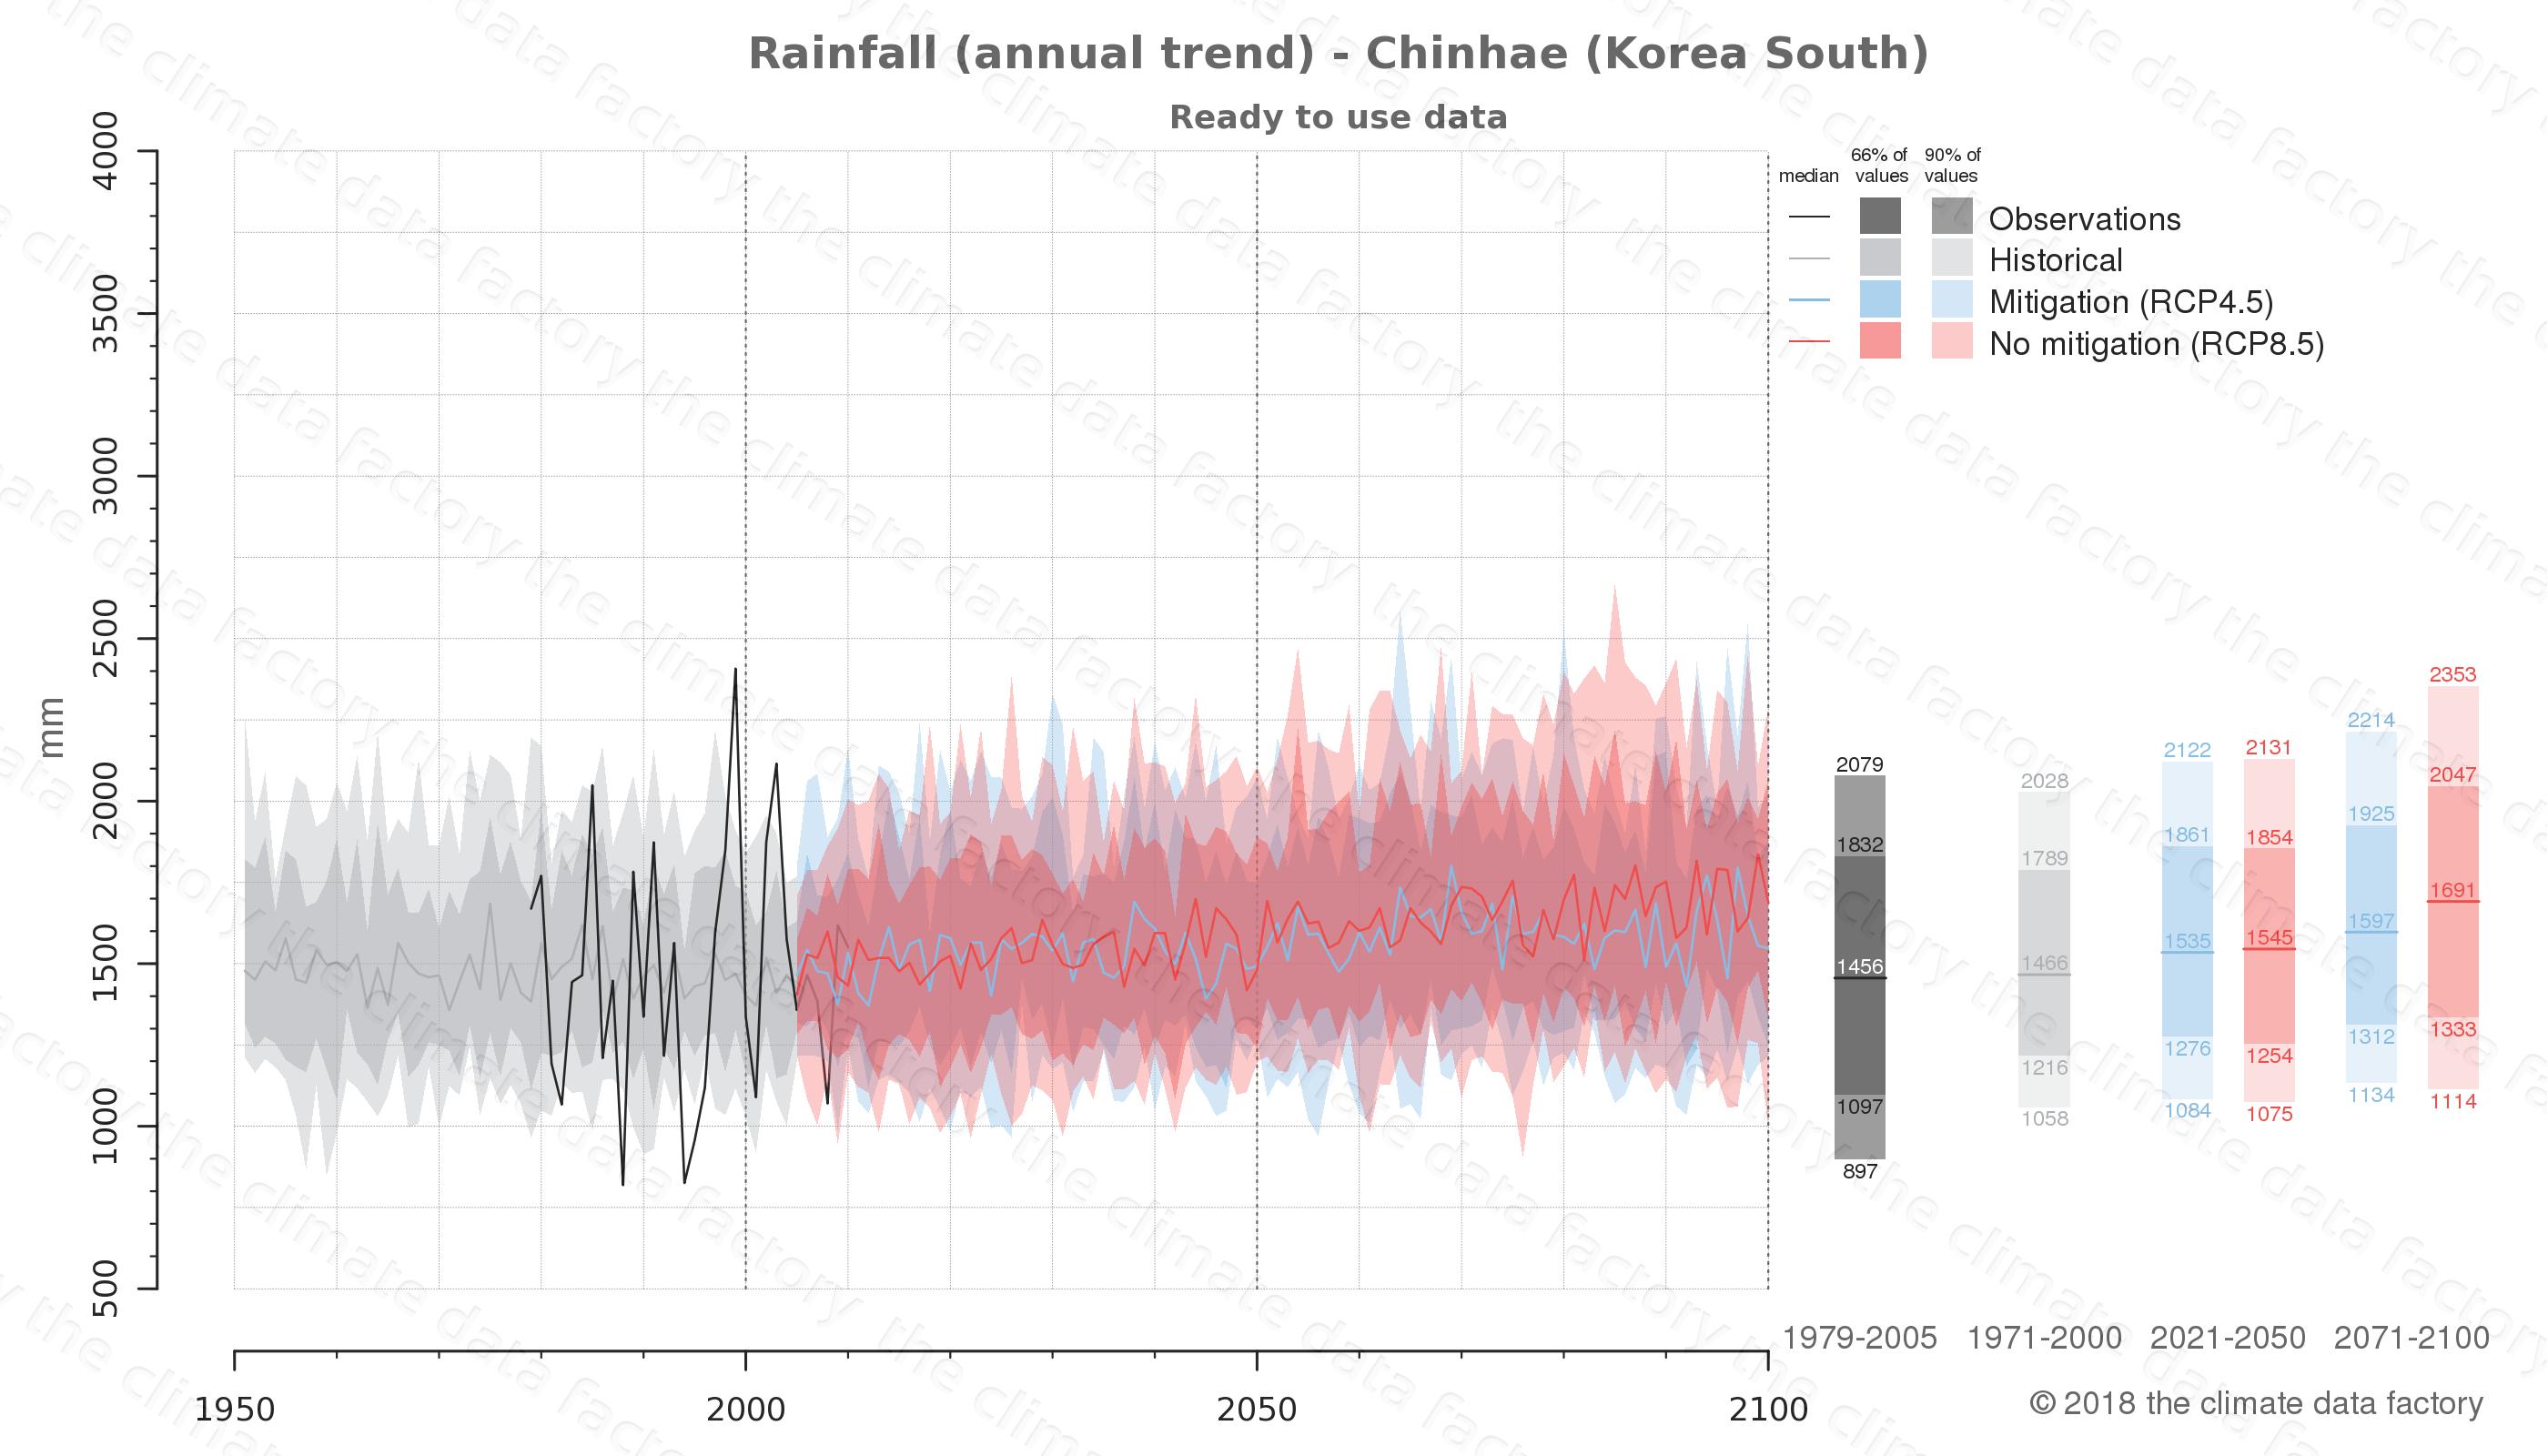 climate change data policy adaptation climate graph city data rainfall chinhae south korea